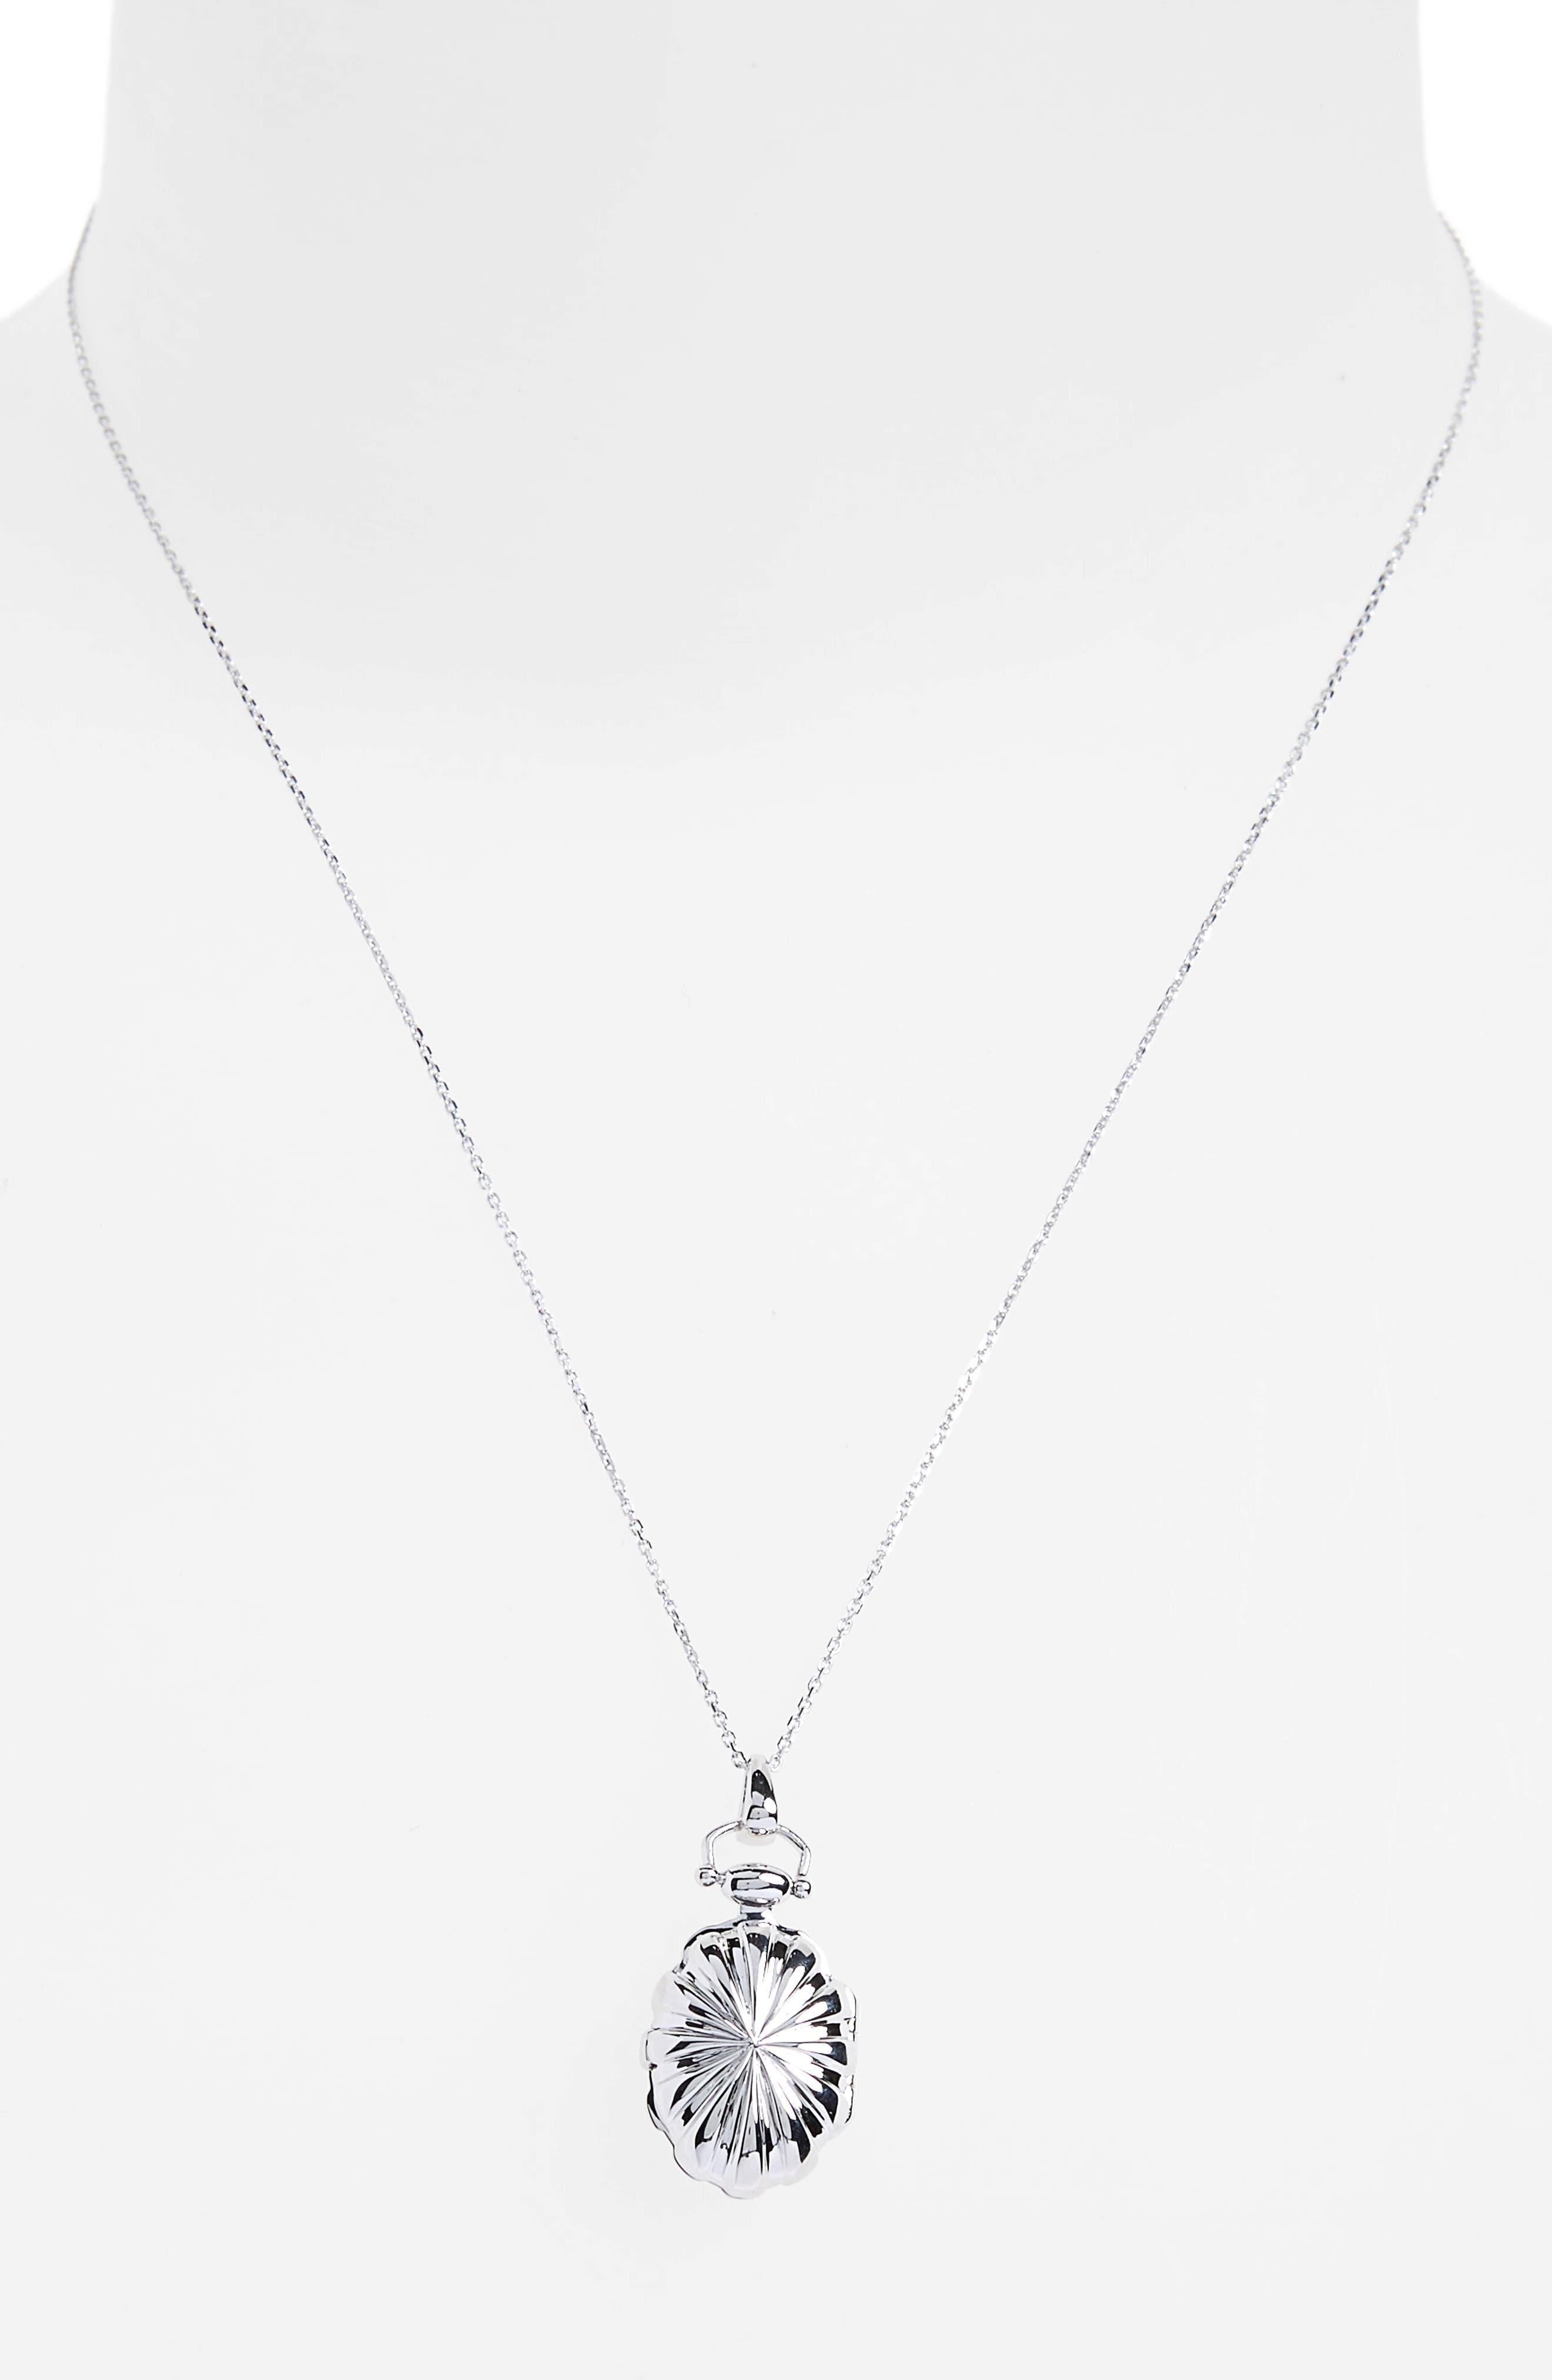 Petite Sunburst Locket Necklace,                             Alternate thumbnail 3, color,                             Sterling Silver